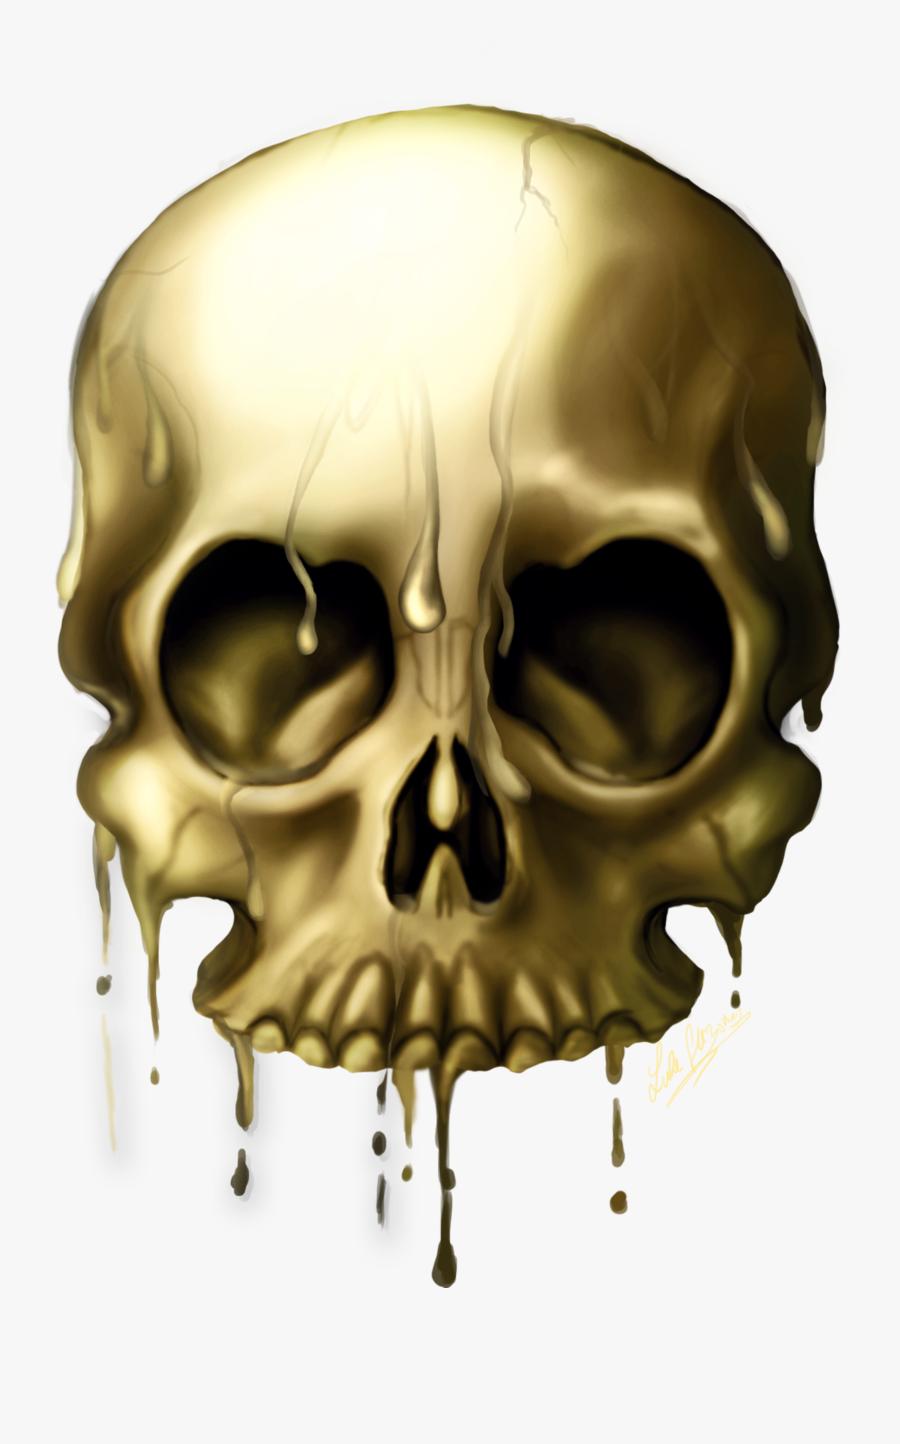 Skulls Png Image, Transparent Clipart